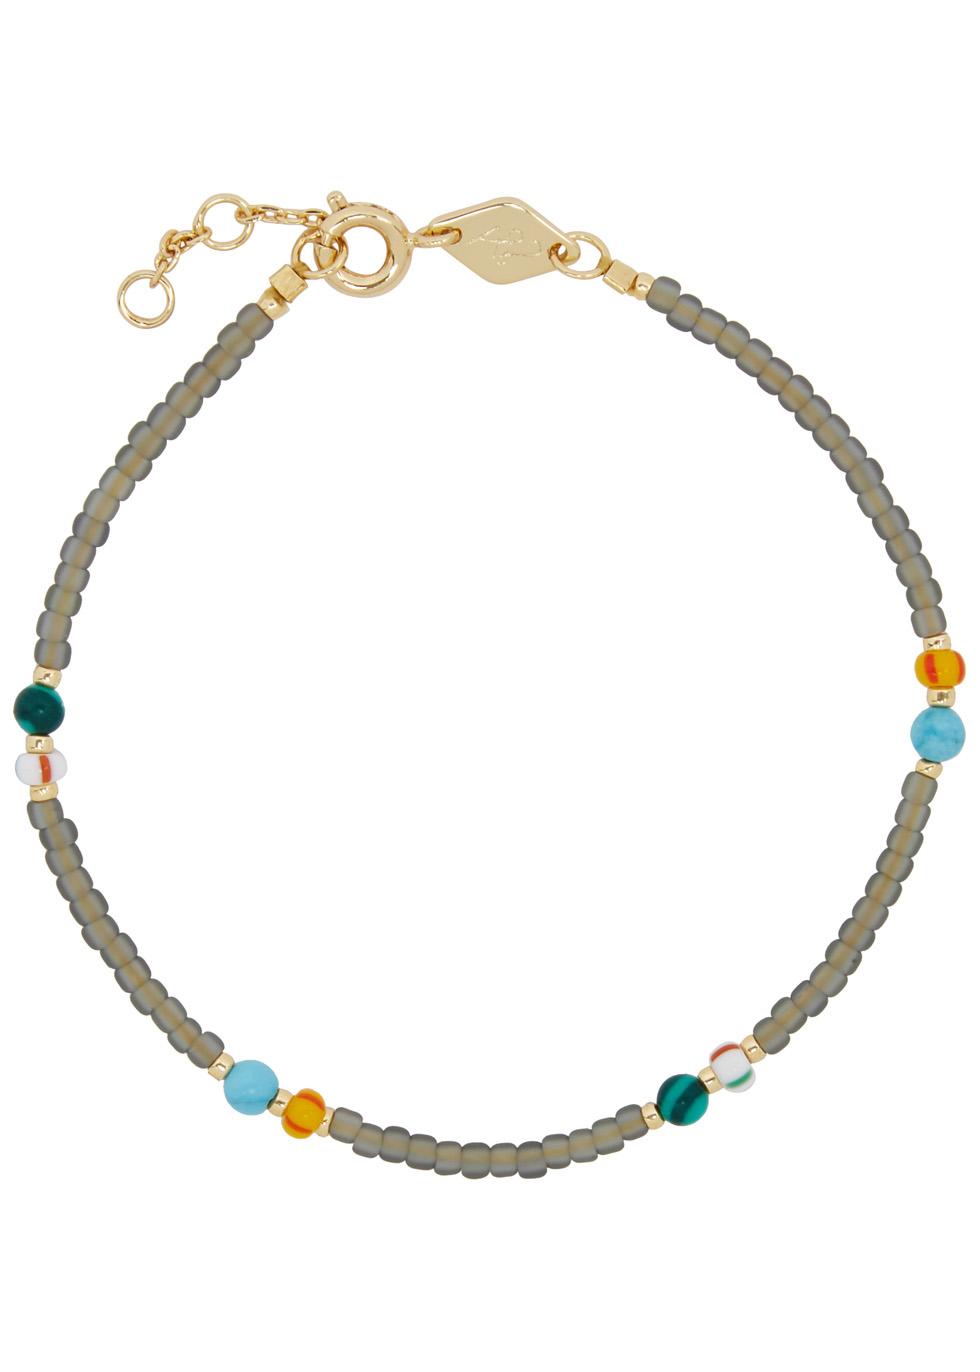 ANNI LU SOHO 18CT GOLD-PLATED BEADED BRACELET